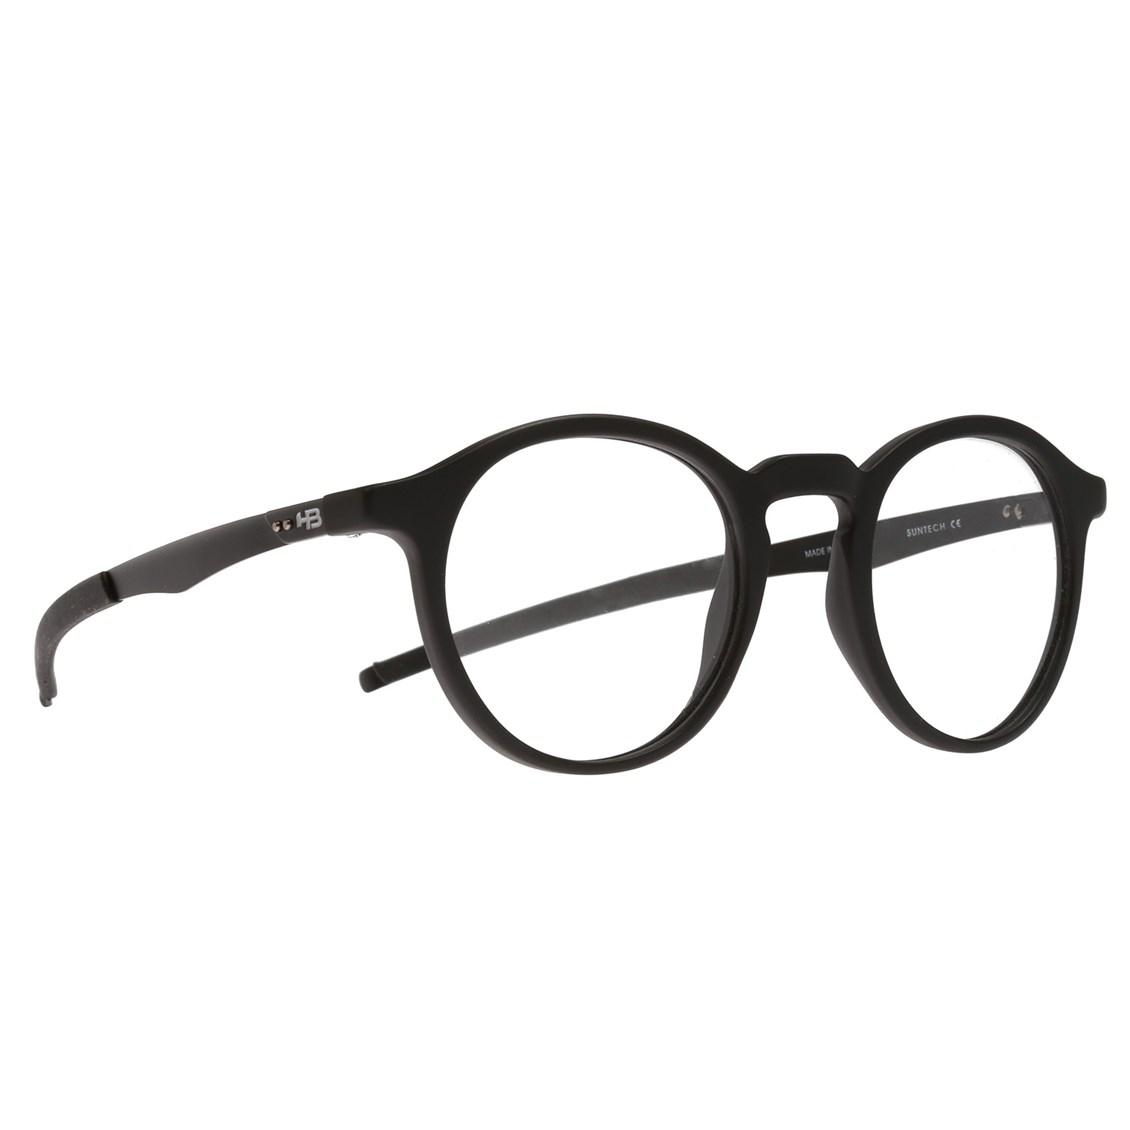 Óculos de Grau HB Duotech 93158 Matte Black Demo